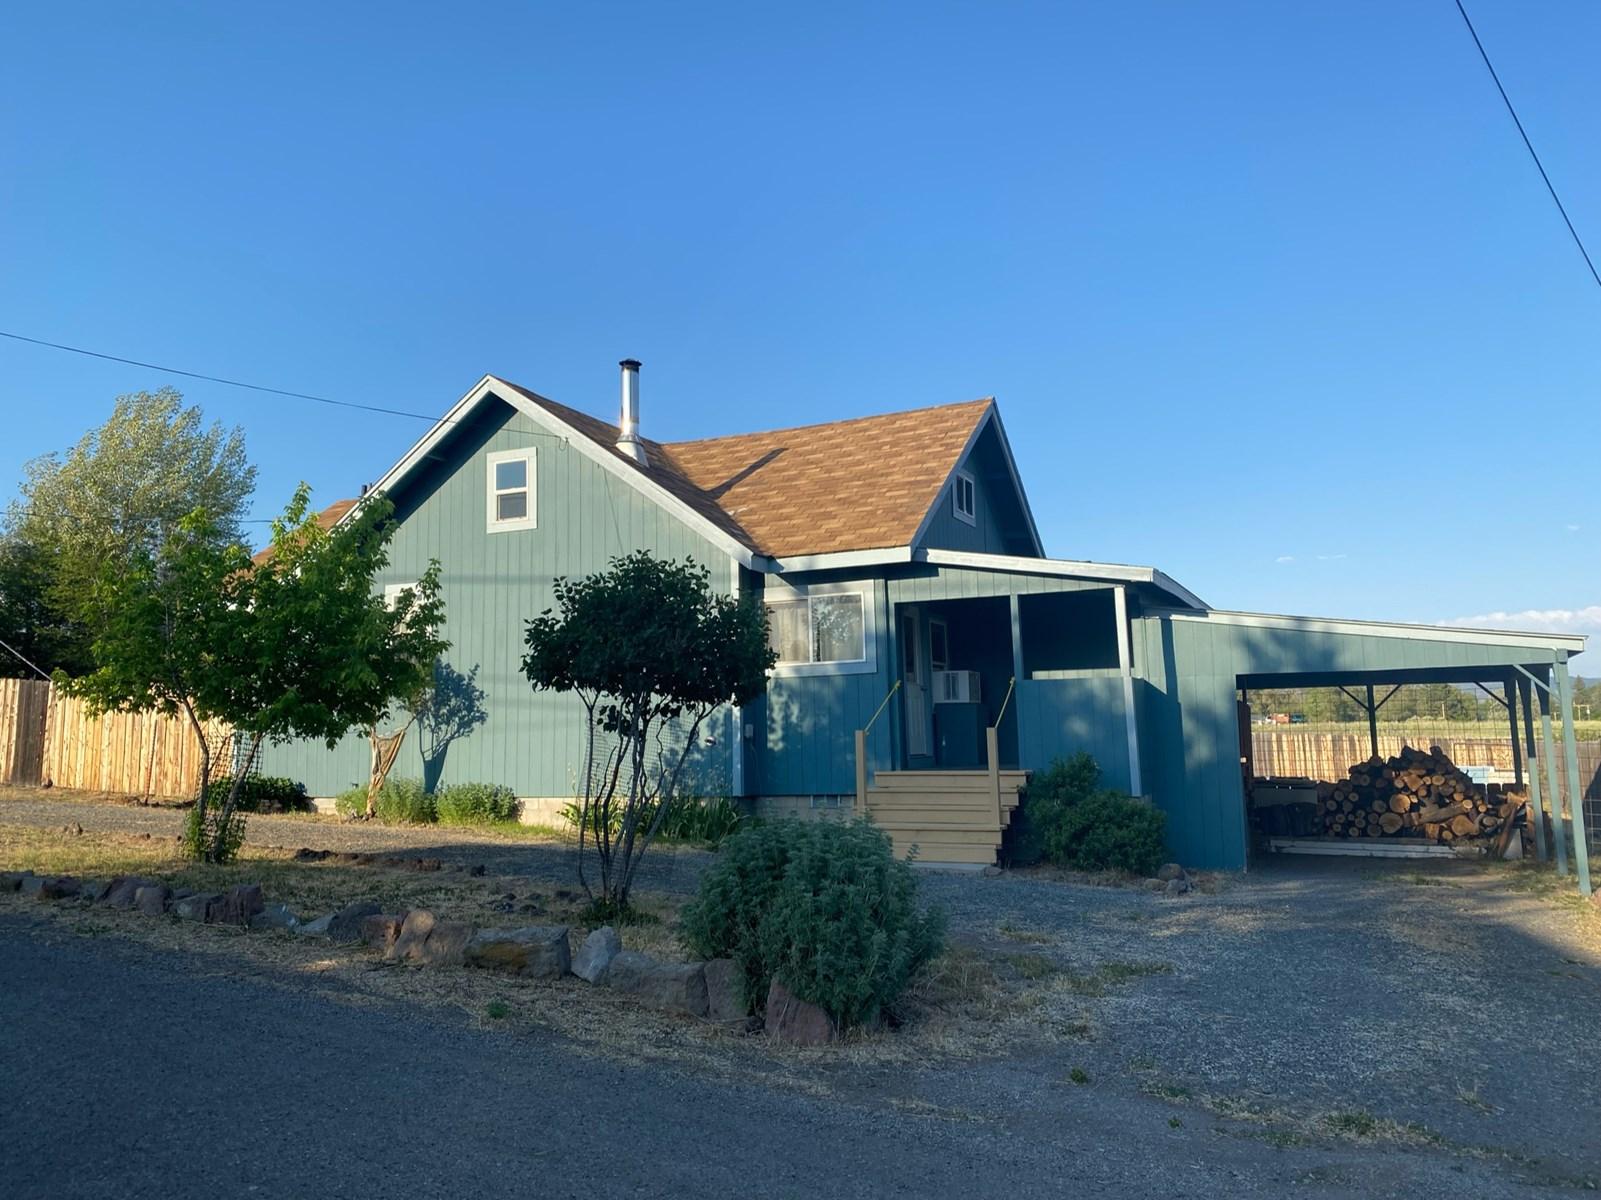 Home For Sale in Modoc County!